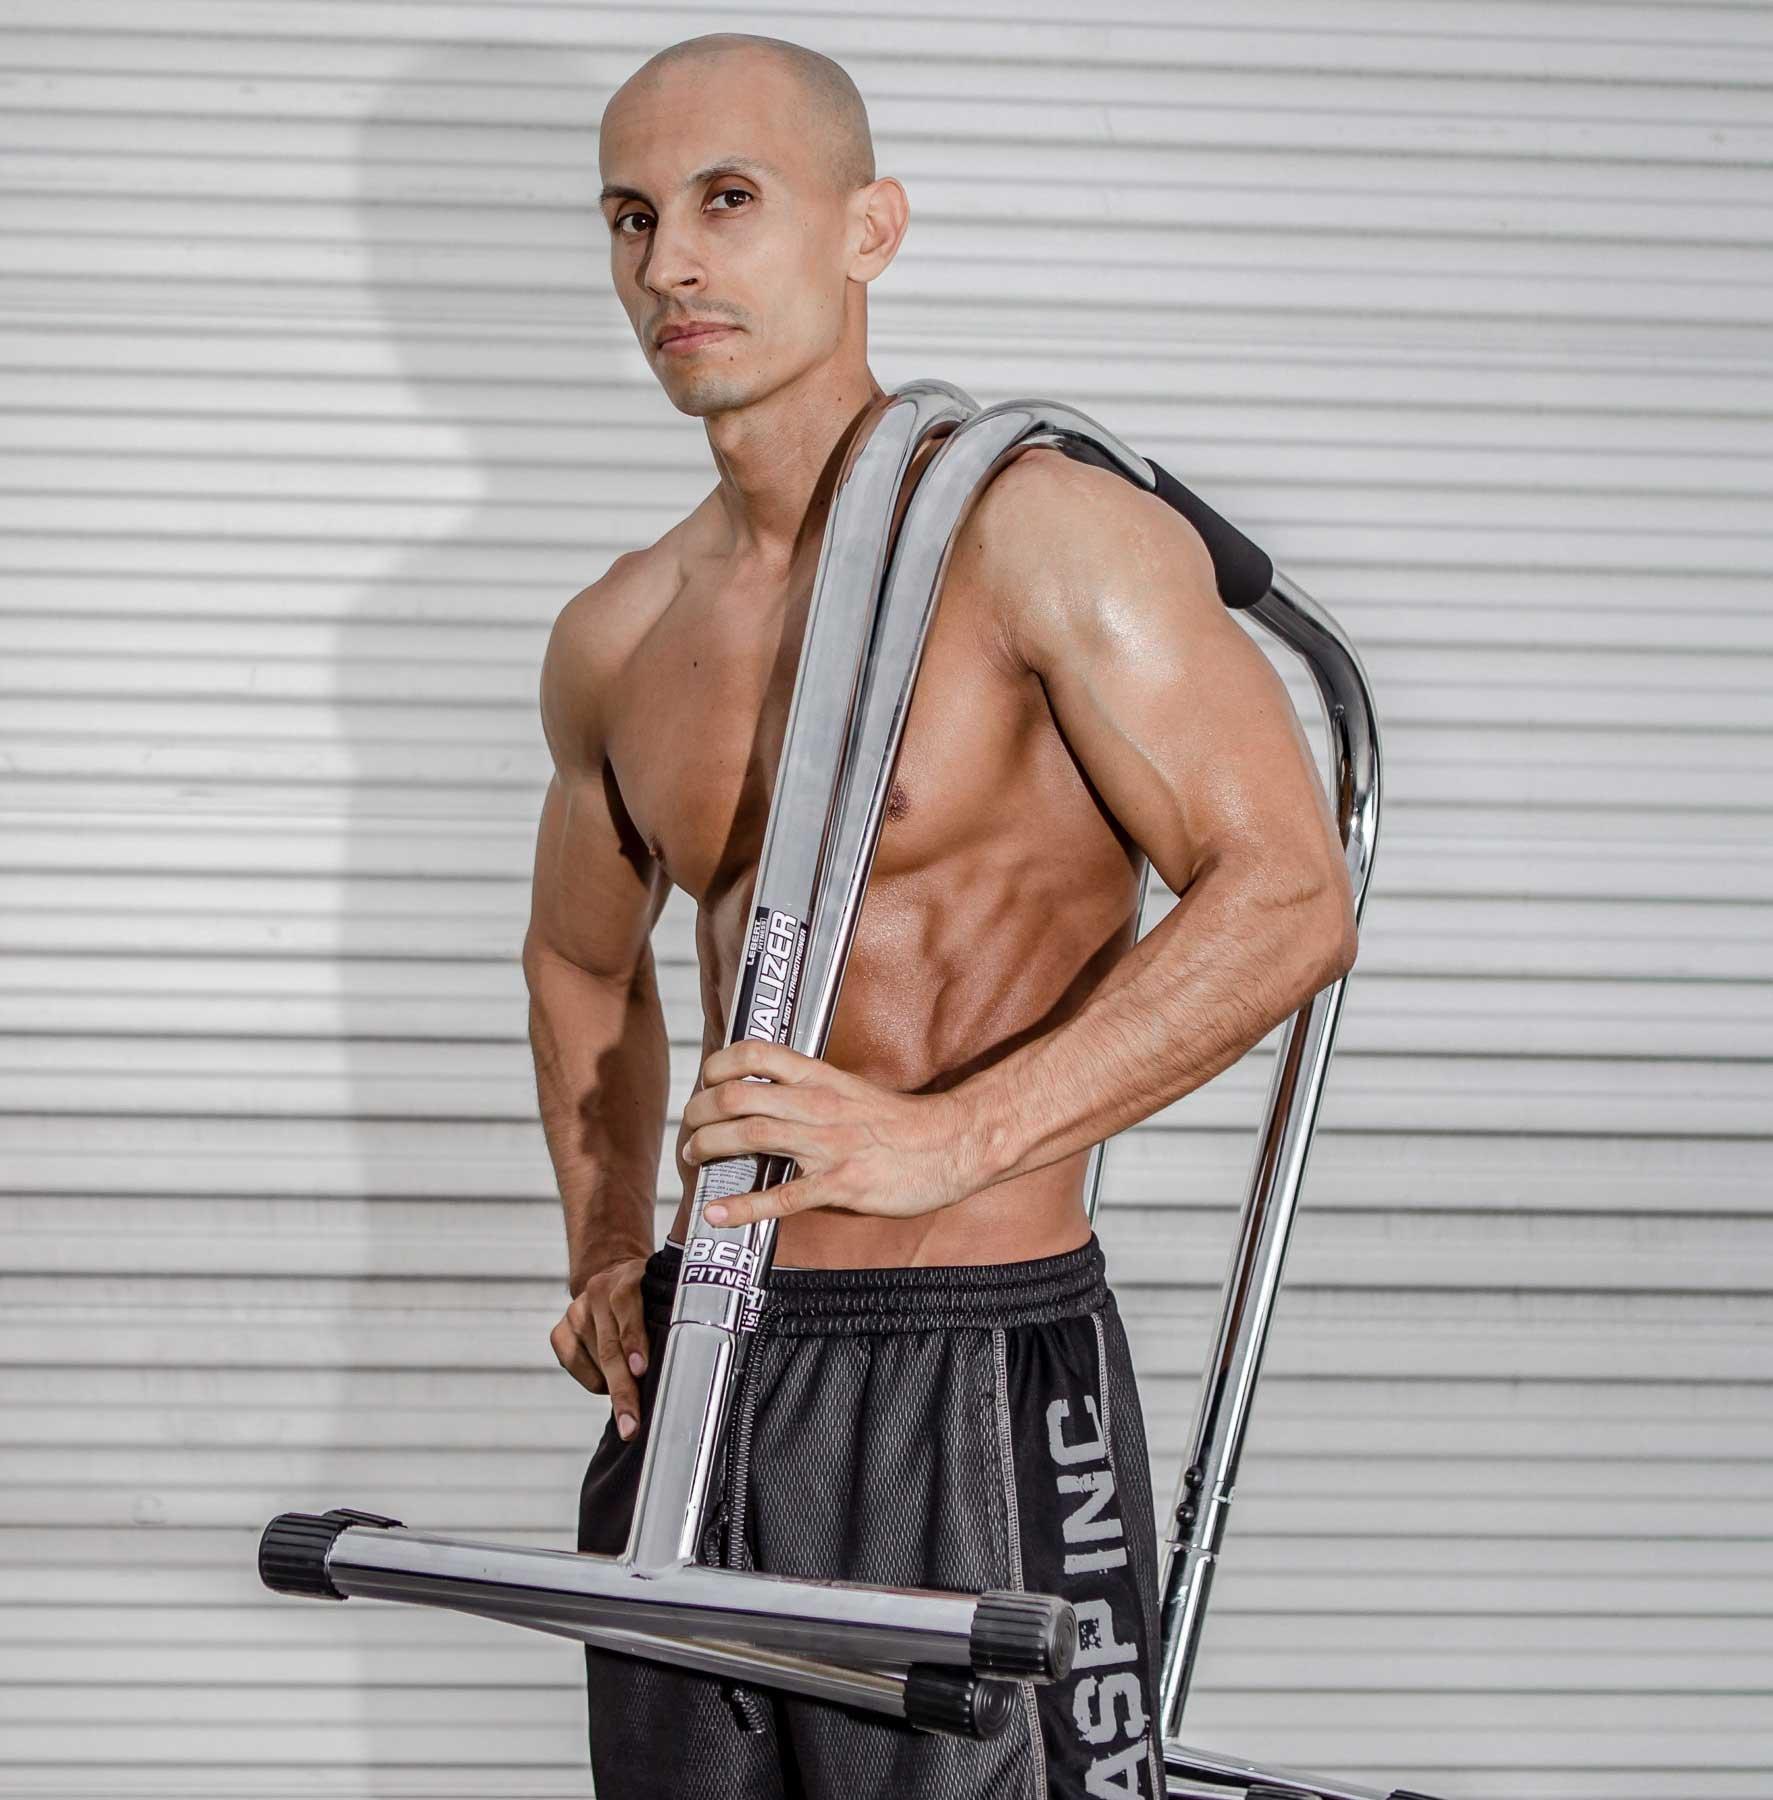 Lebert Fitness Equalizer Bars Total Body Strengthener, XL, Frank Medrano Signature, Chrome by Lebert (Image #2)